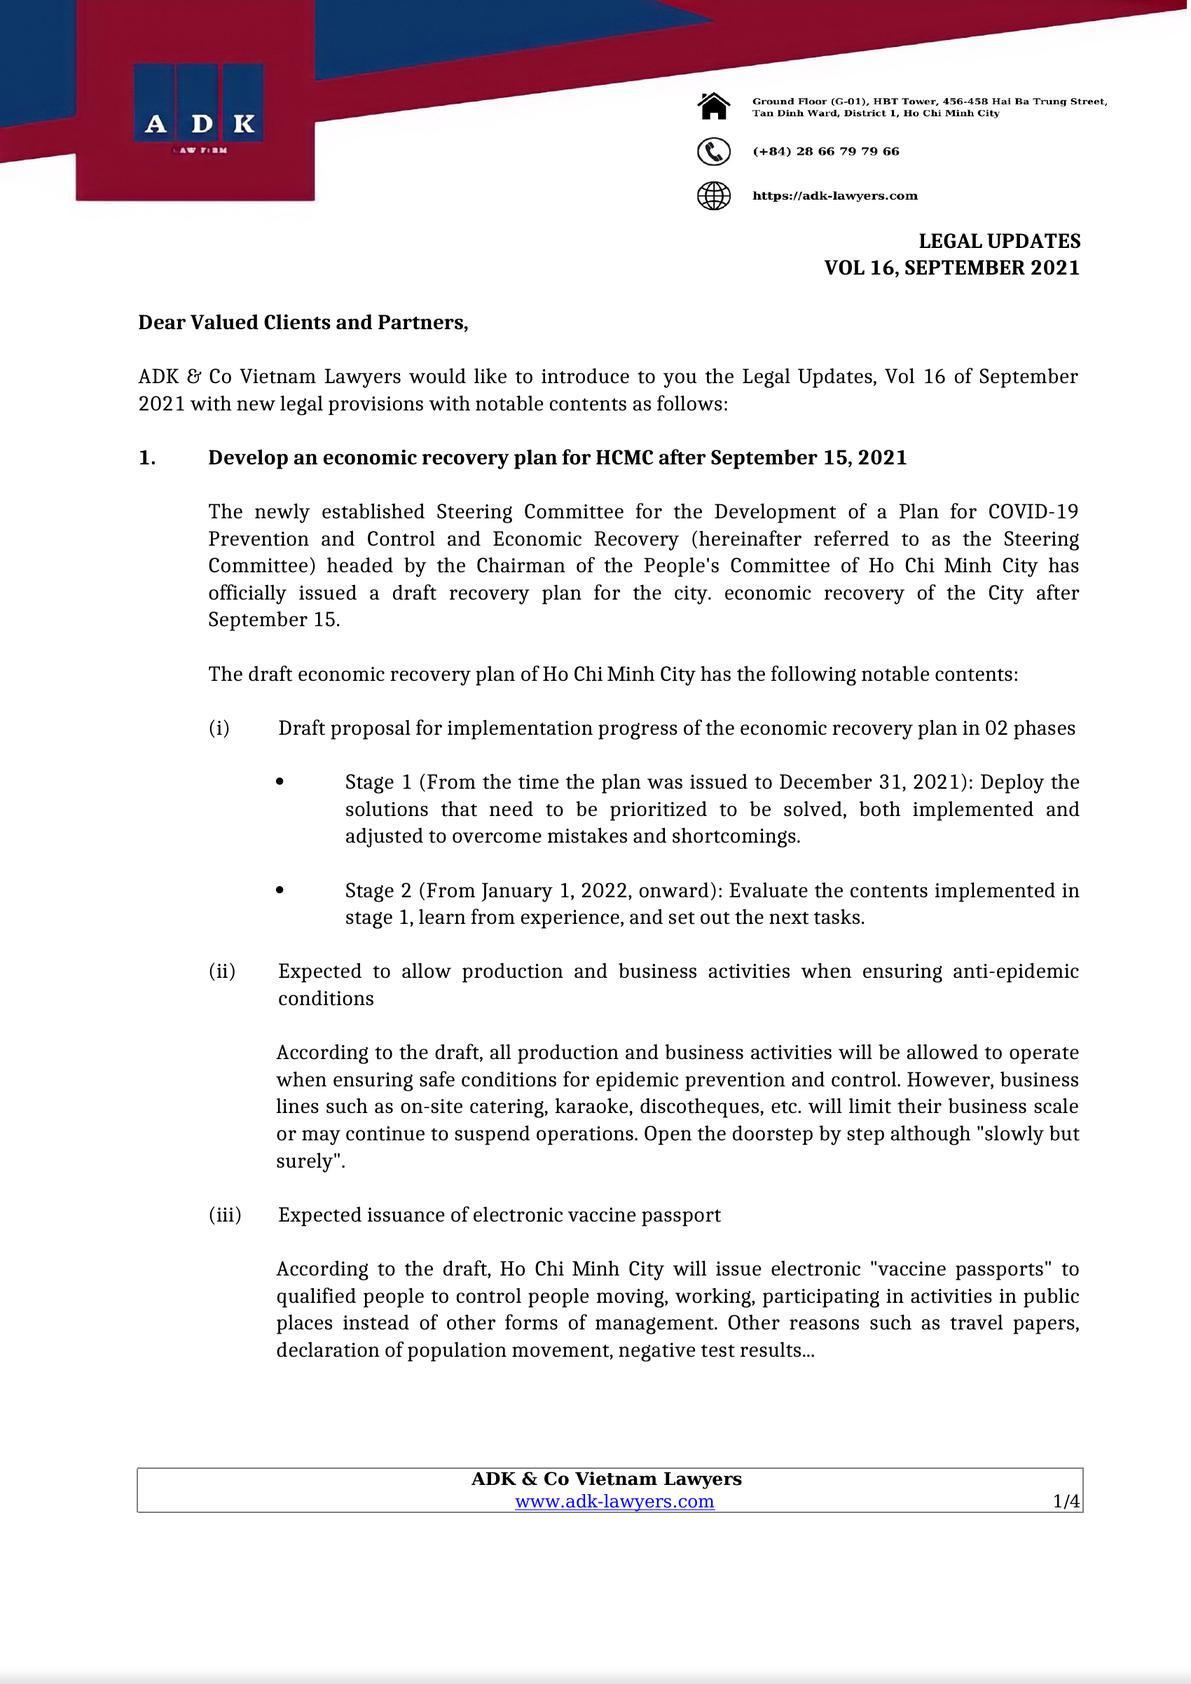 Legal Update Vol 16 September 2021-0